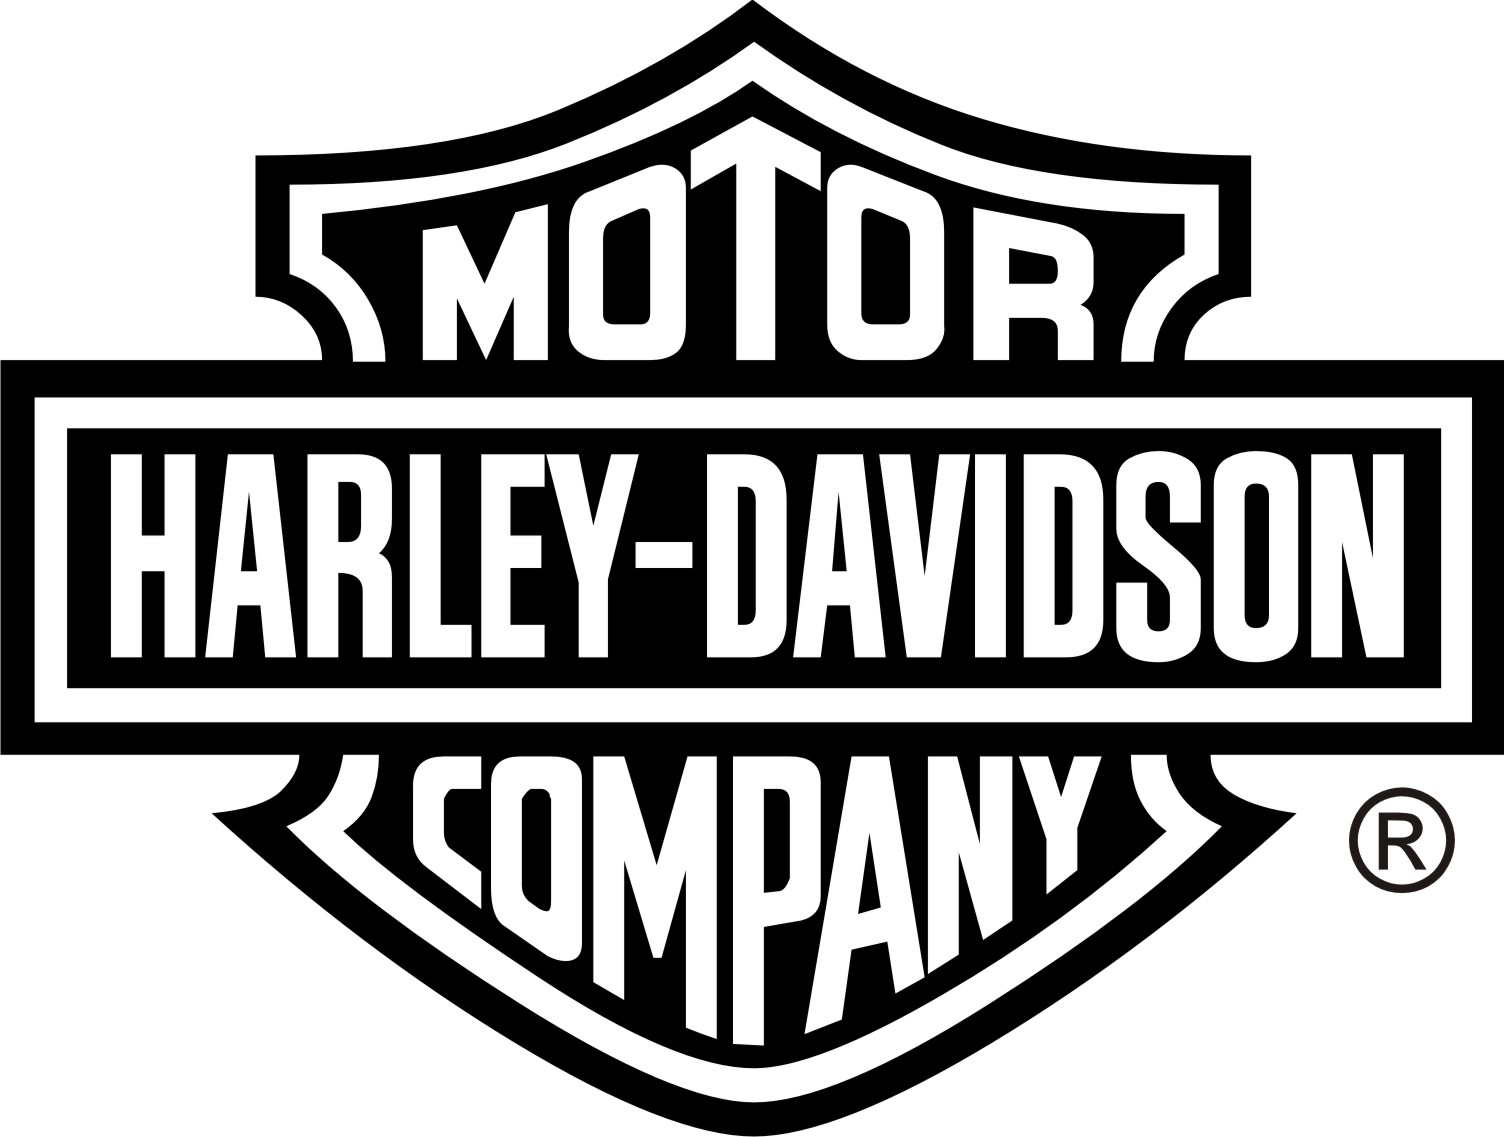 harley davidson logo hd wallpapers | backgrounds